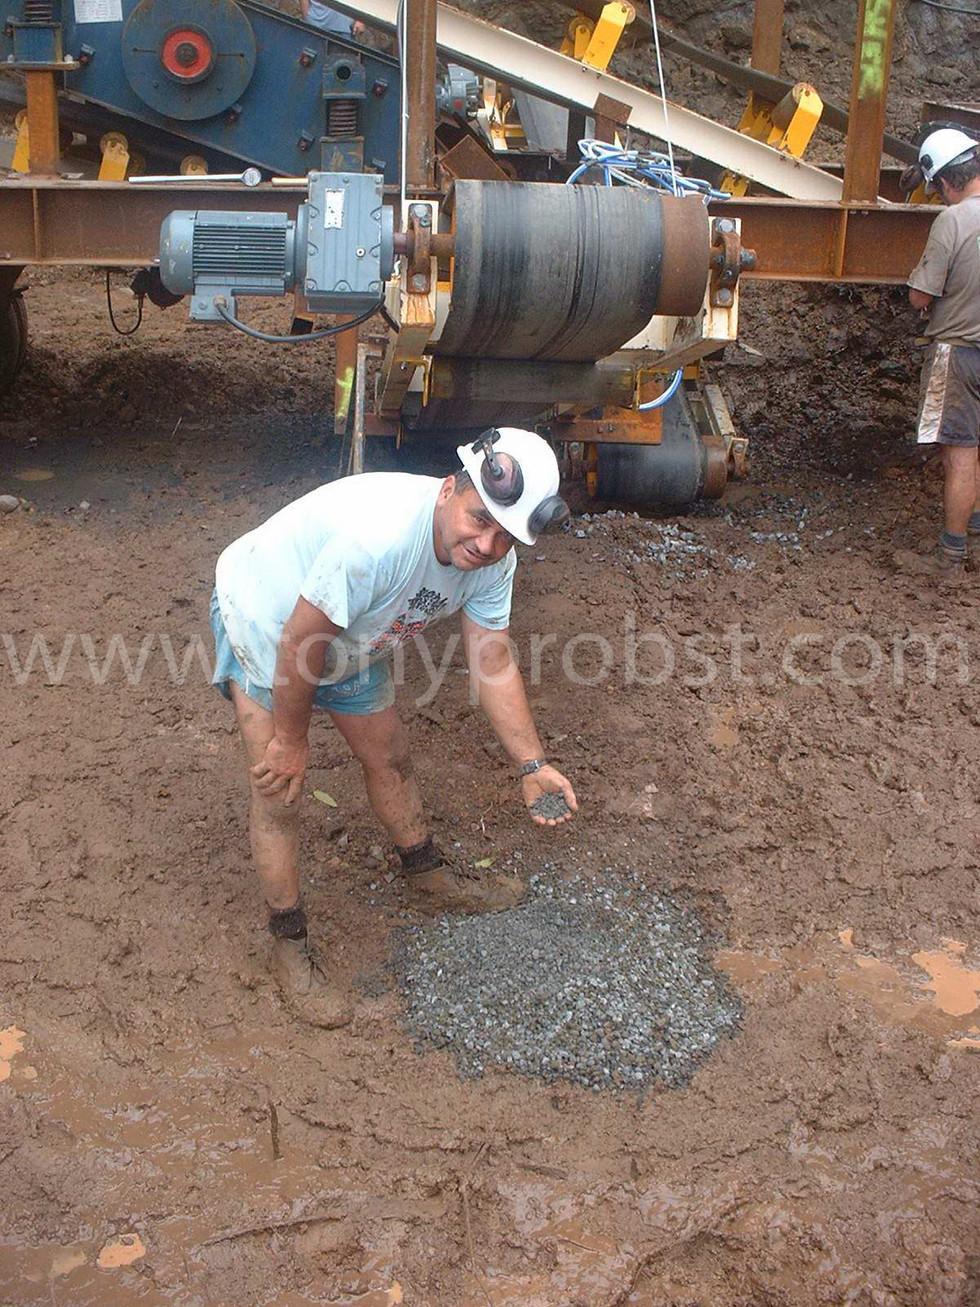 2005 June 5 First gravel